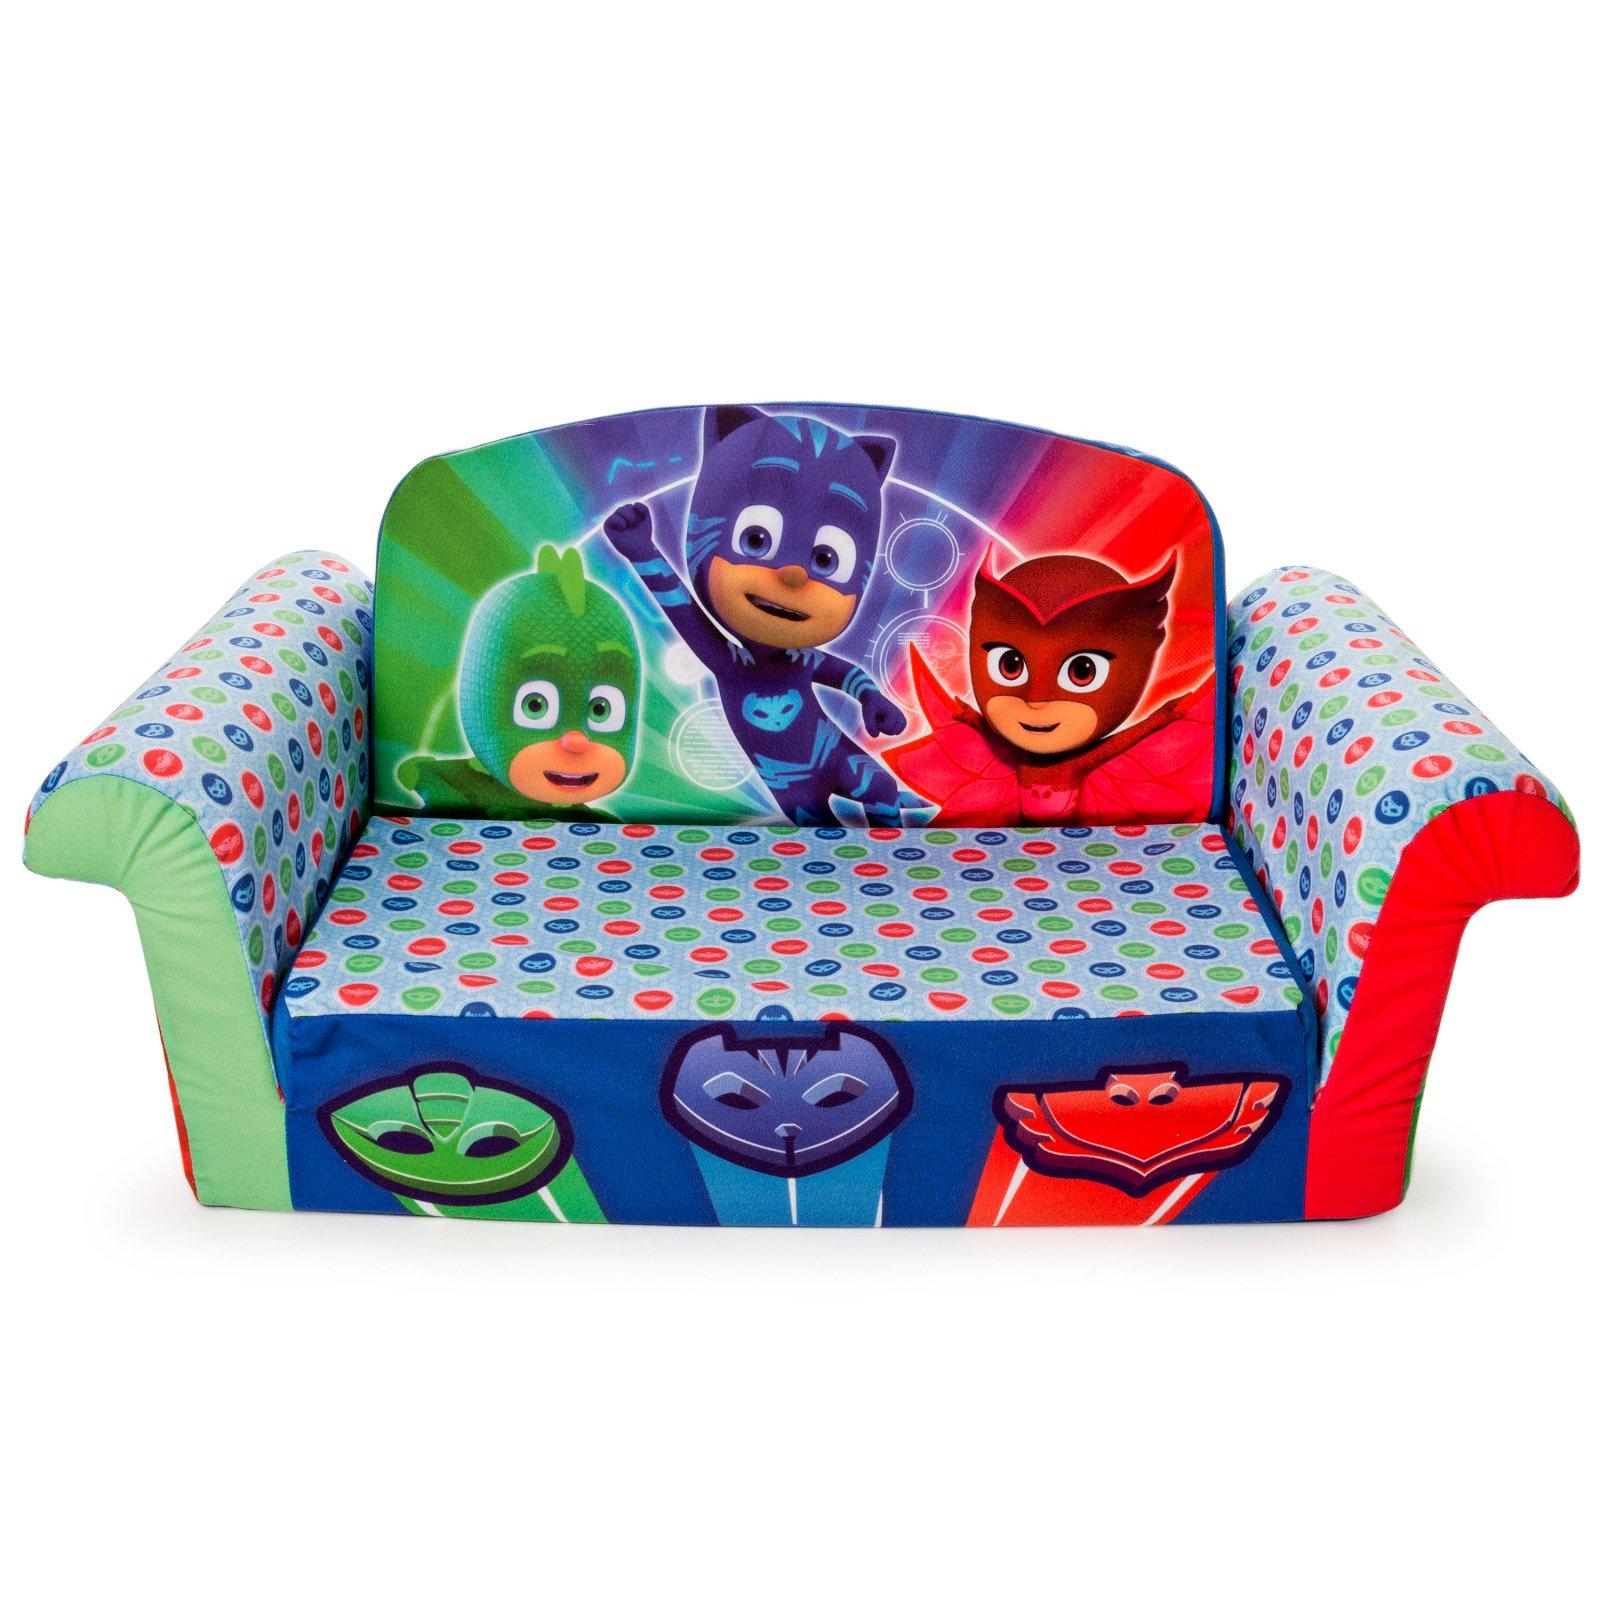 Marshmallow Furniture - Children's 2 in 1 Flip Open Foam Sofa, PJ Masks Flip Open Sofa by Marshmallow Furniture